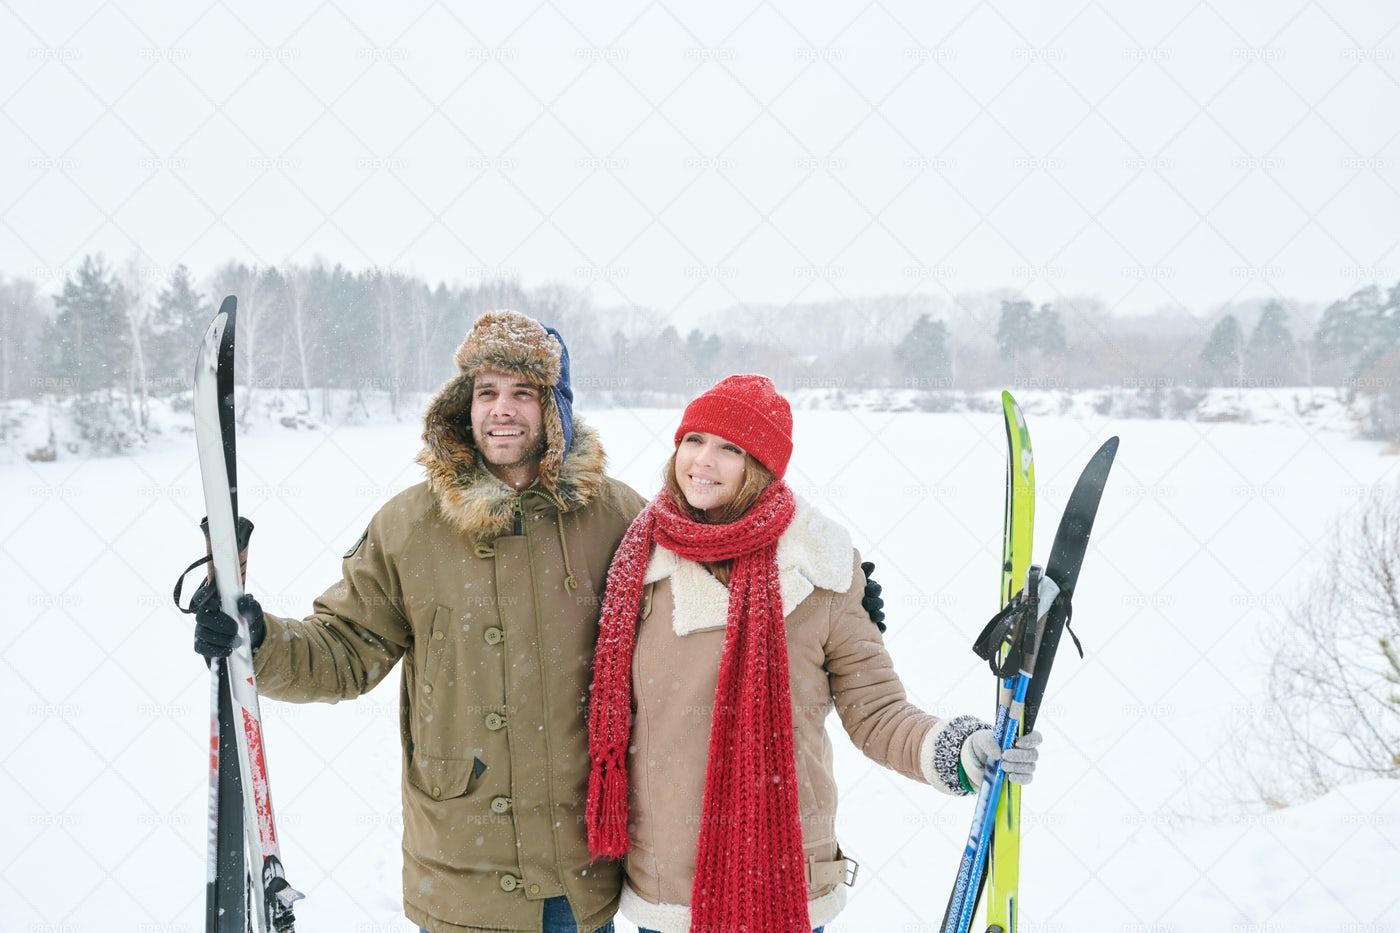 Smiling Couple Holding Skis: Stock Photos